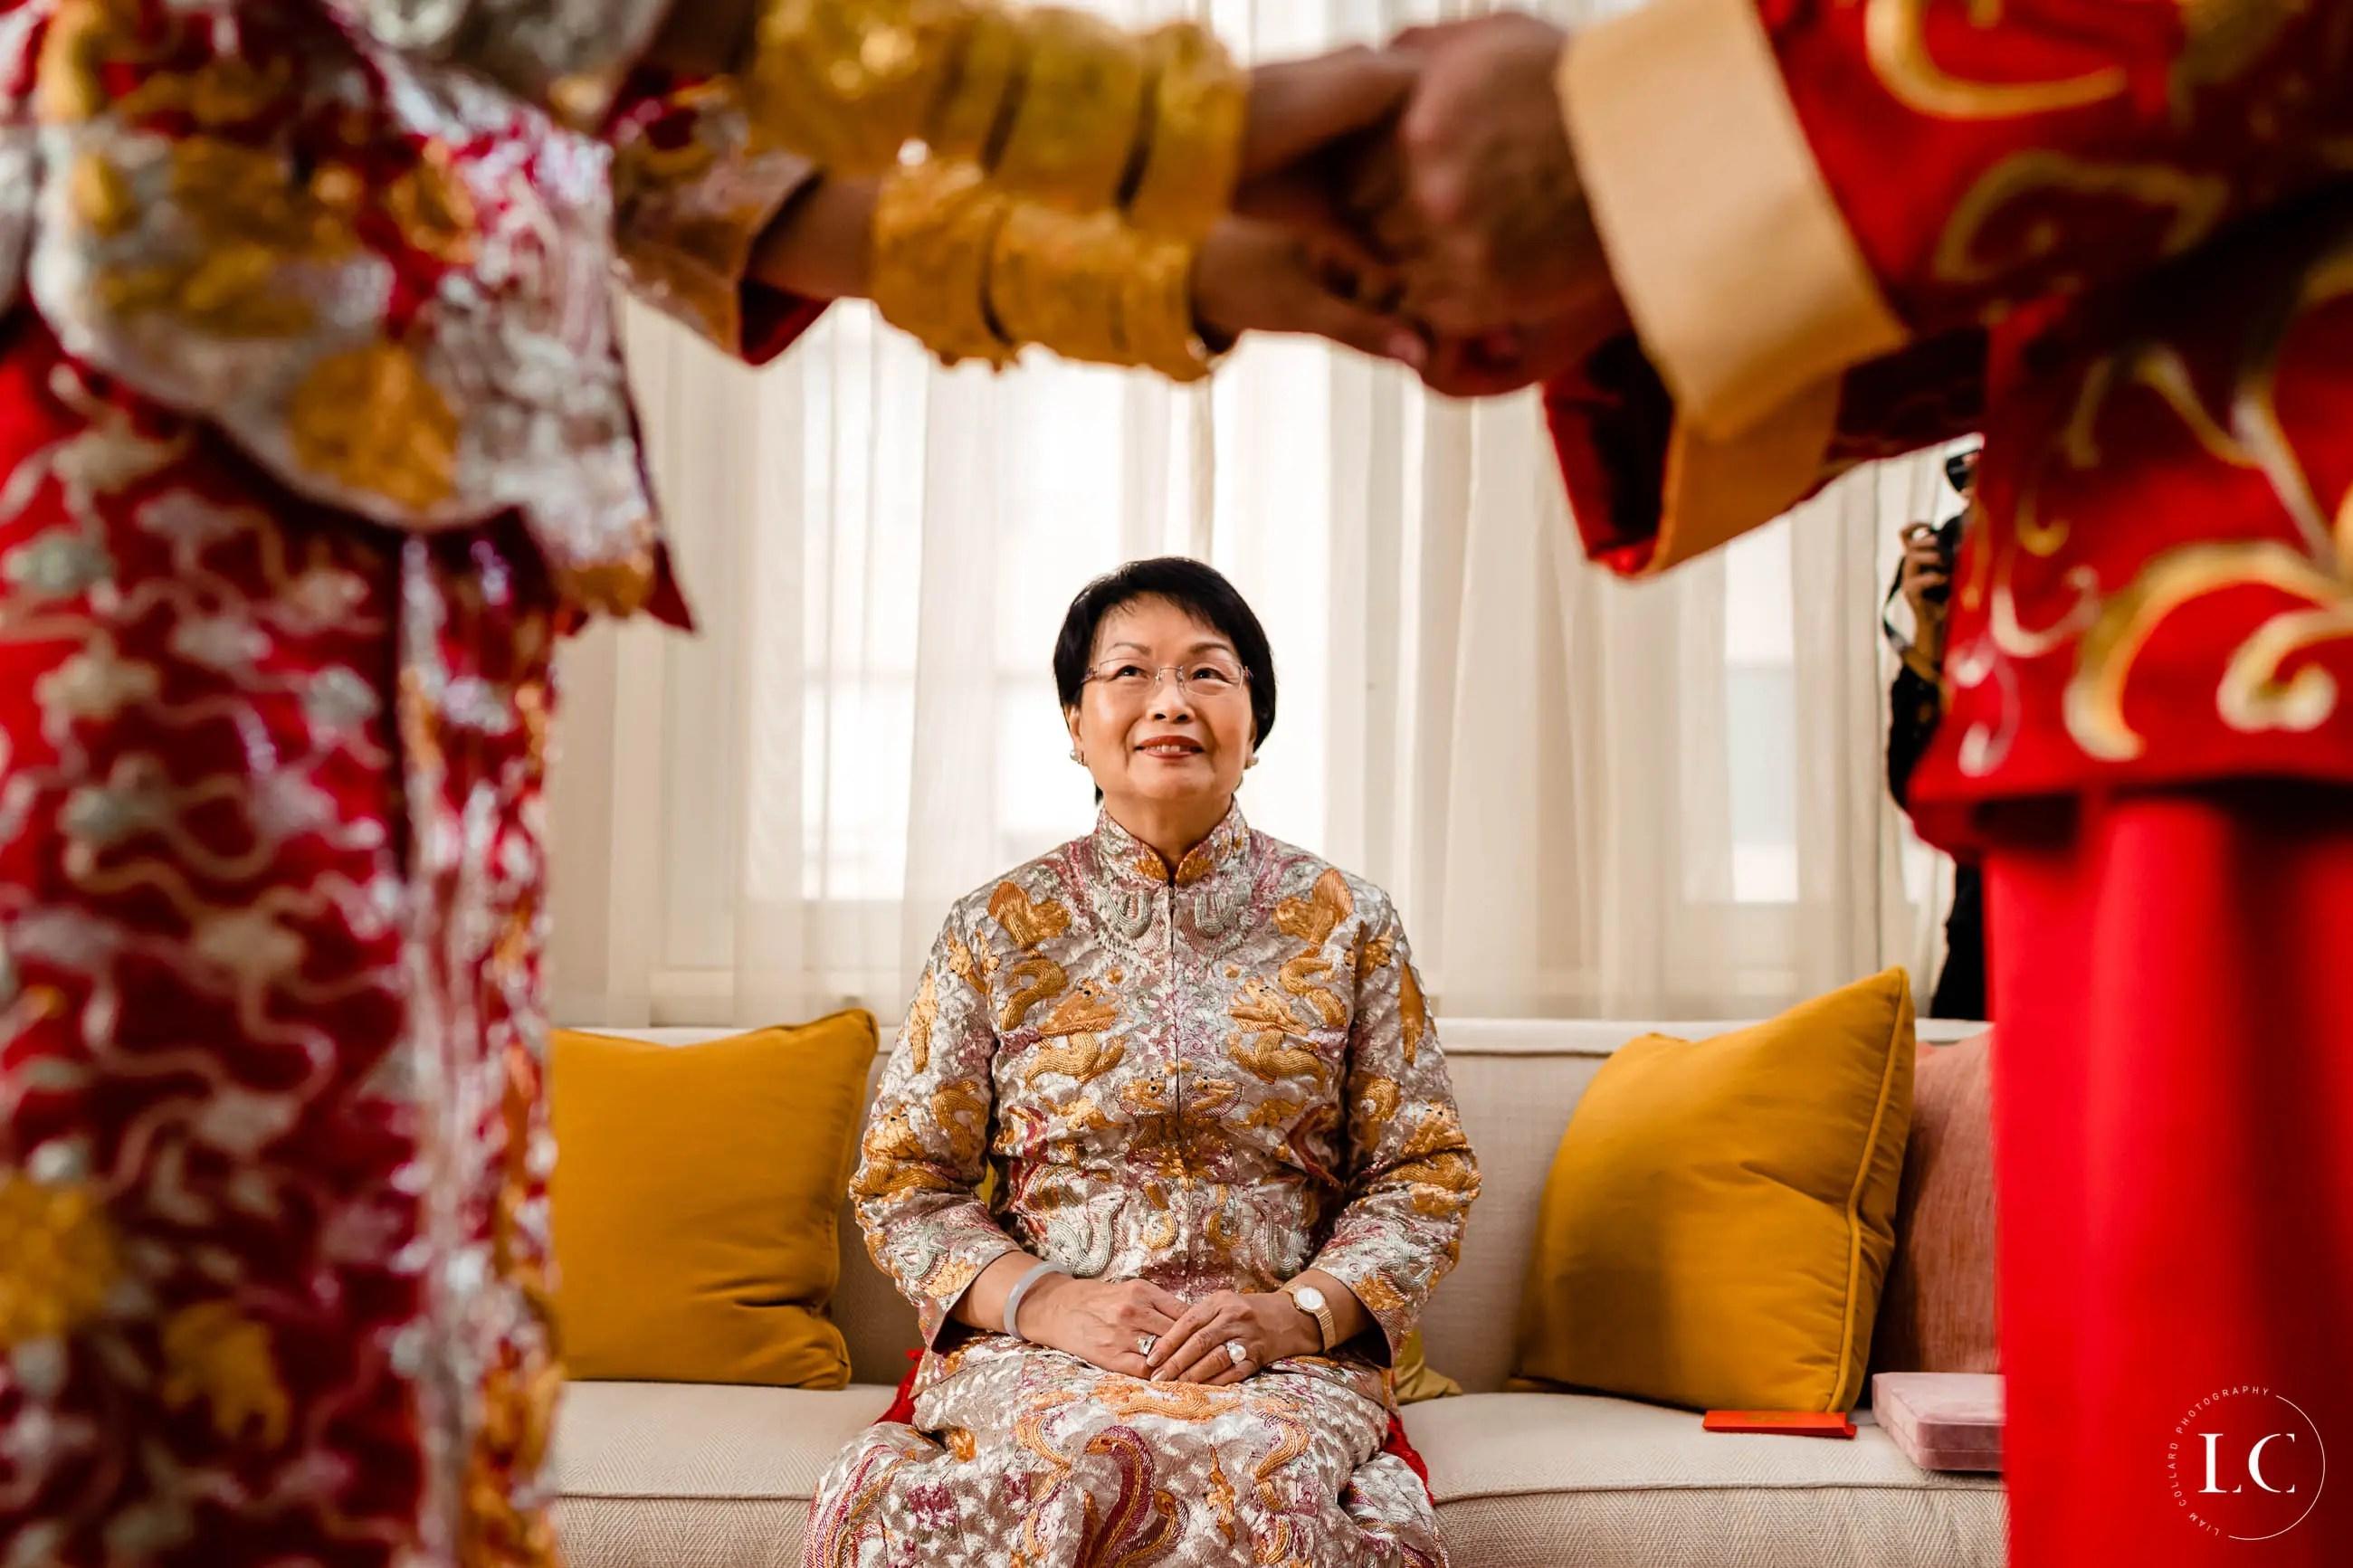 Mother of the bride Hong Kong